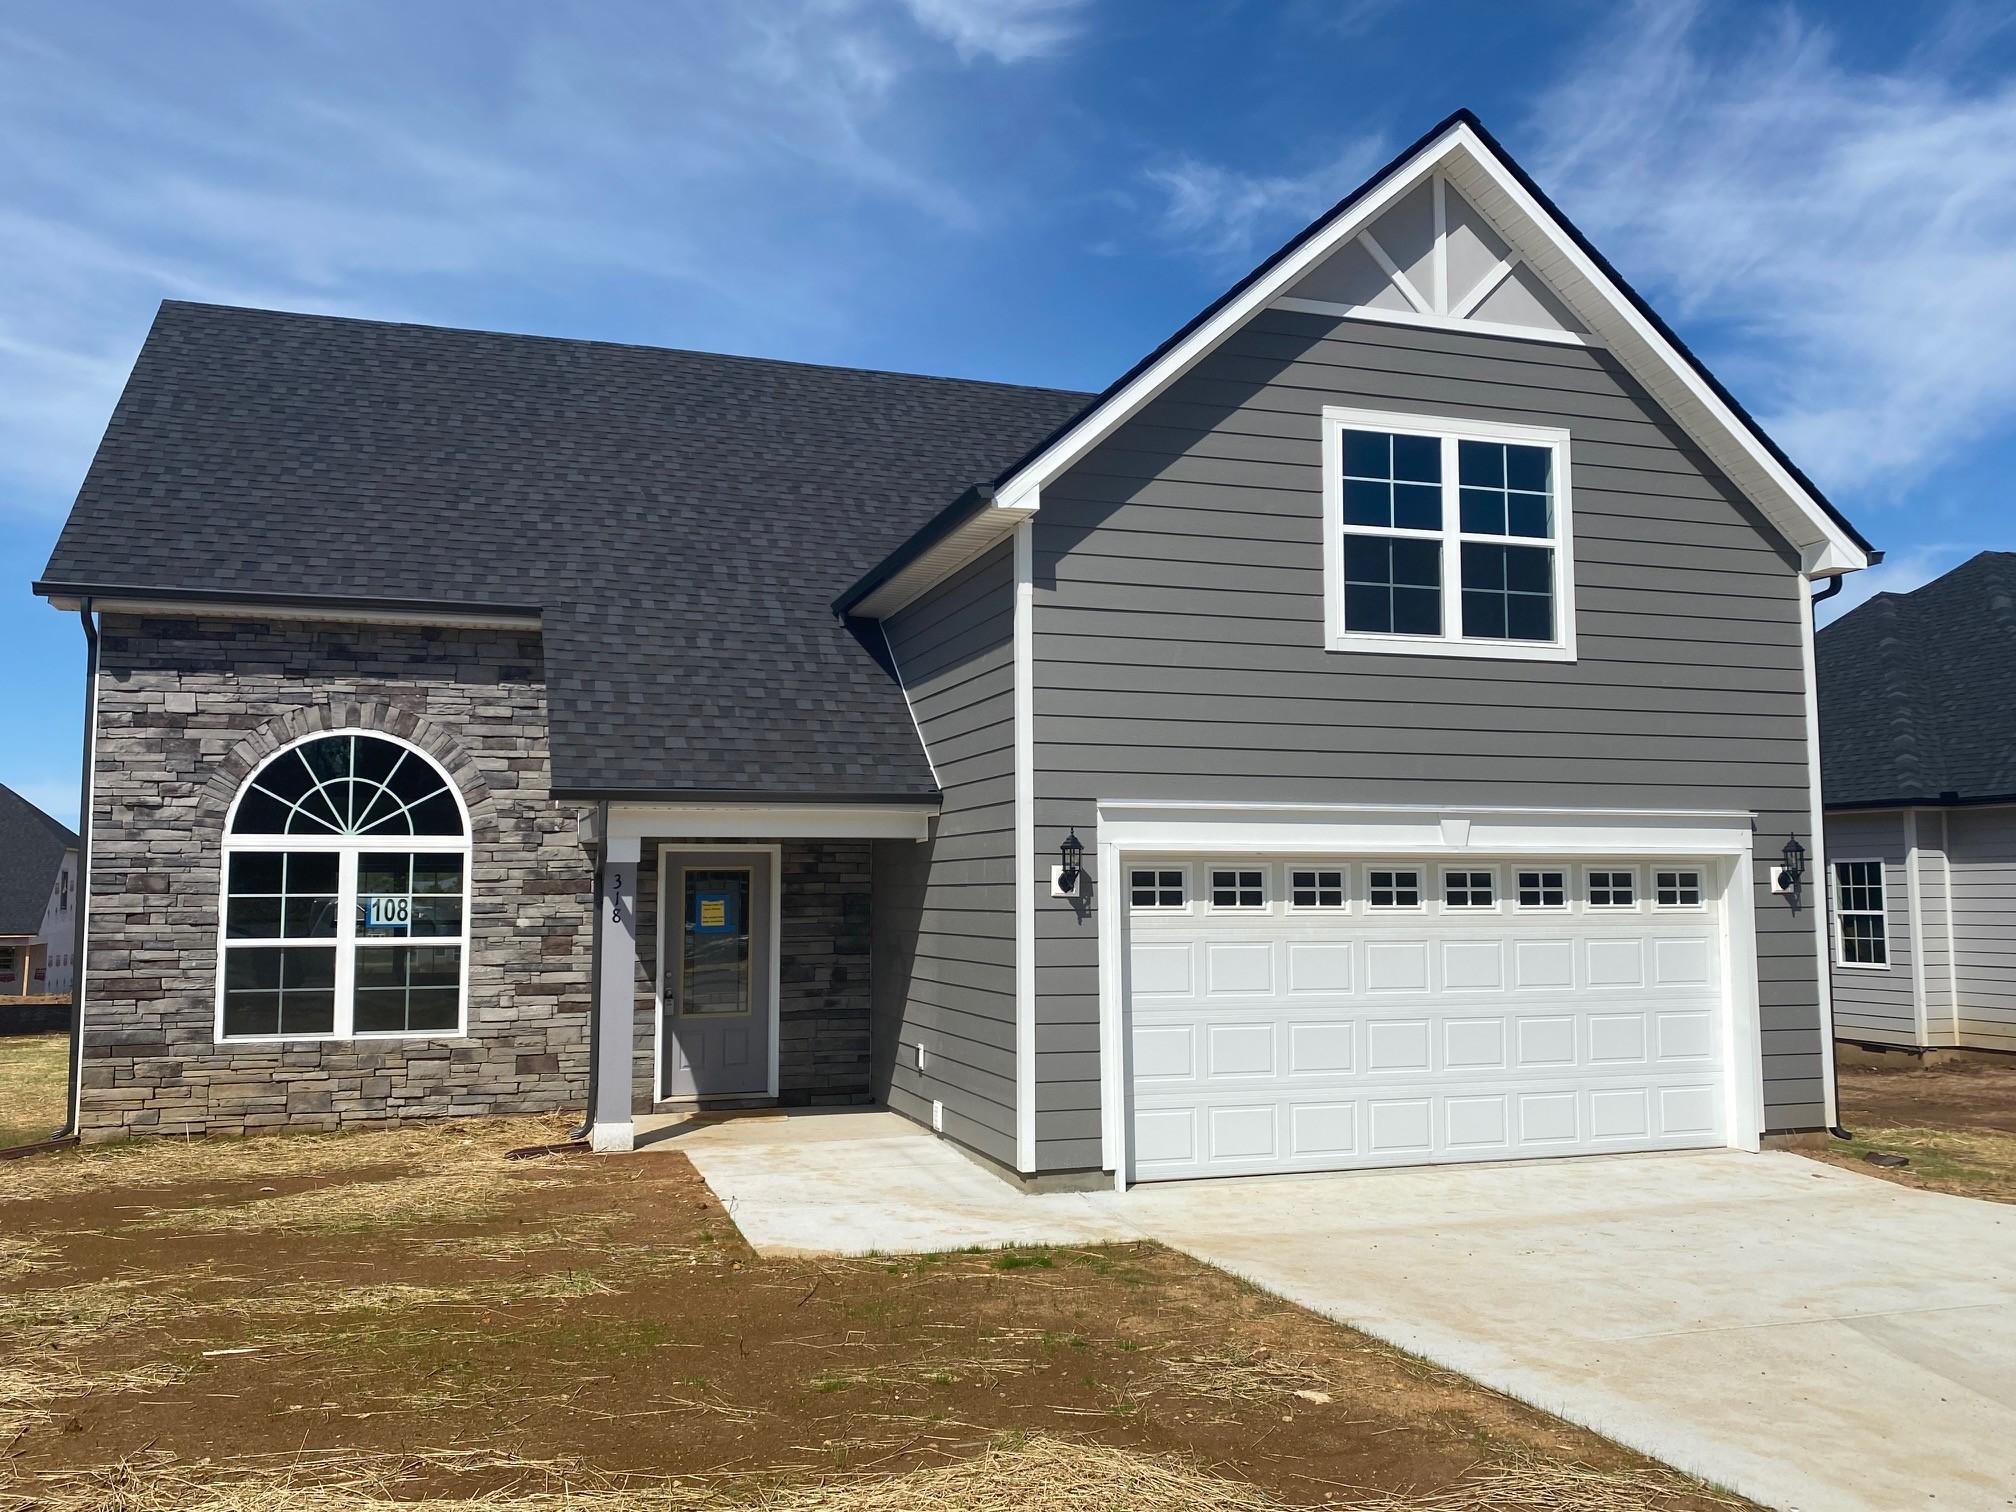 318 Big Son Lane, Lot 108, Smyrna, TN 37167 - Smyrna, TN real estate listing